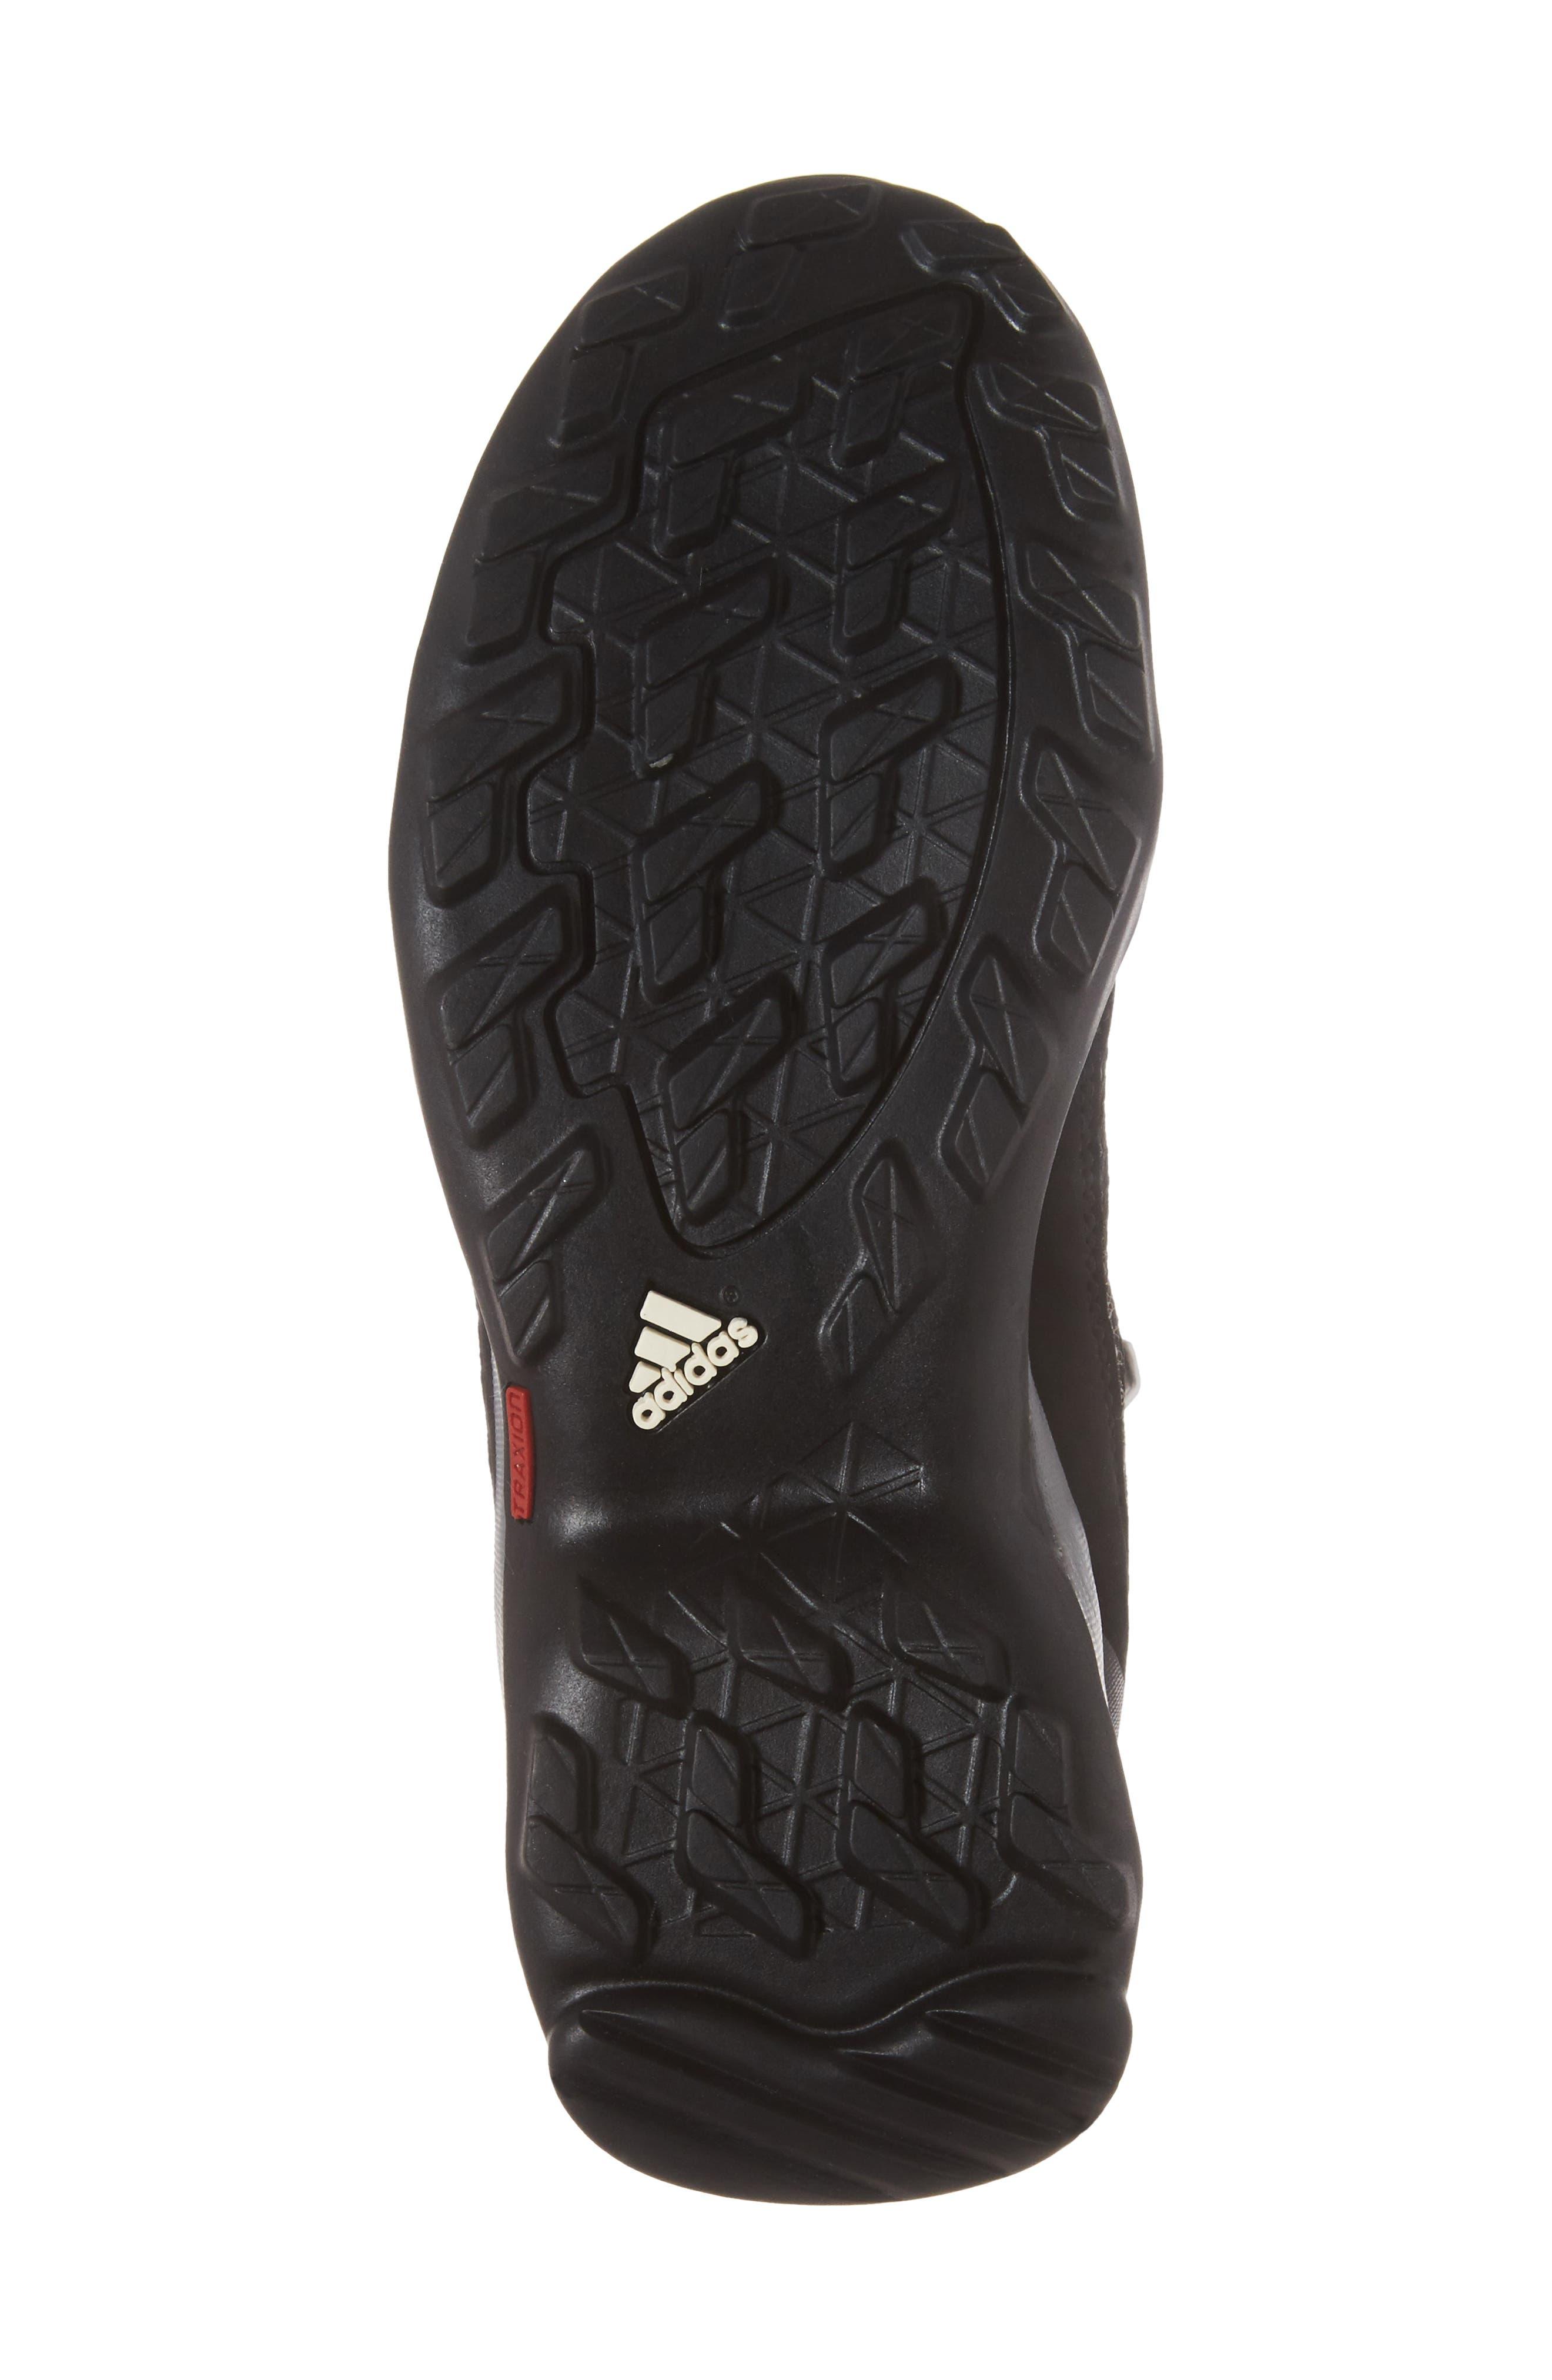 Terrex Mid Gore-Tex<sup>®</sup> Insulated Waterproof Sneaker Boot,                             Alternate thumbnail 6, color,                             Black/ Black/ Vista Grey